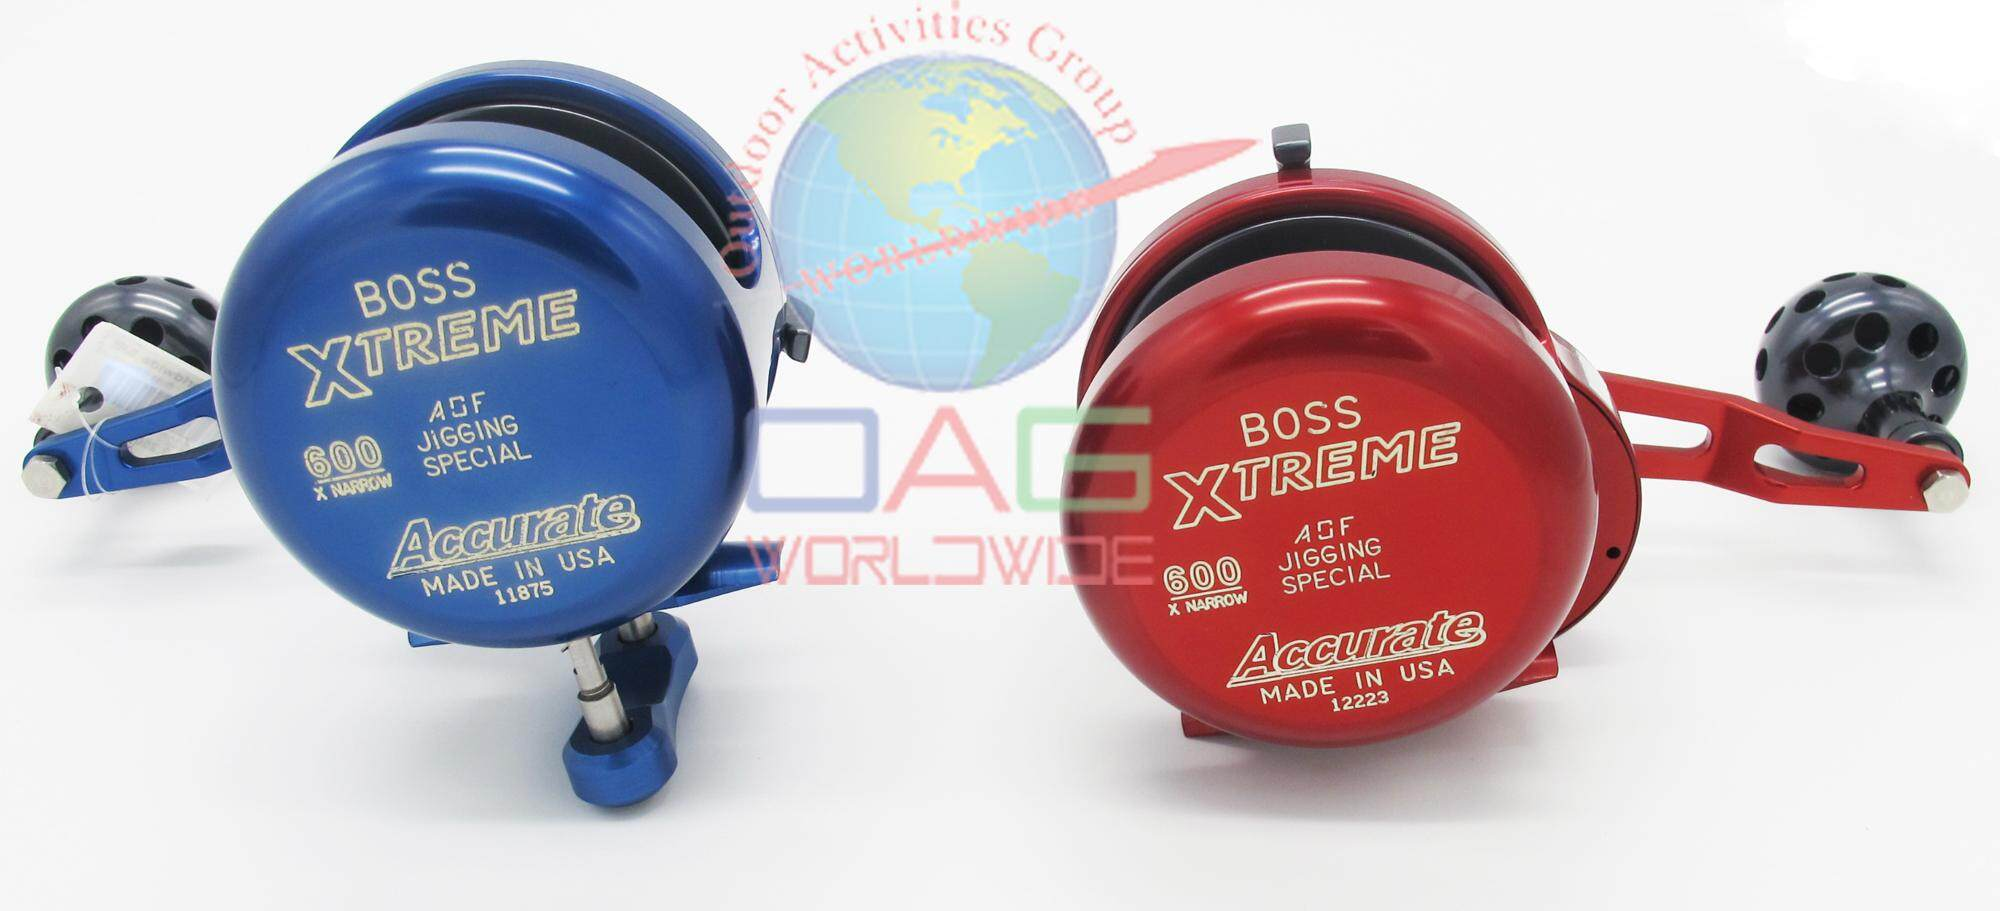 Boss Xtreme Jigging Special-BXJ-600XNN(Blue) & BXJ-600XXNN(Red)